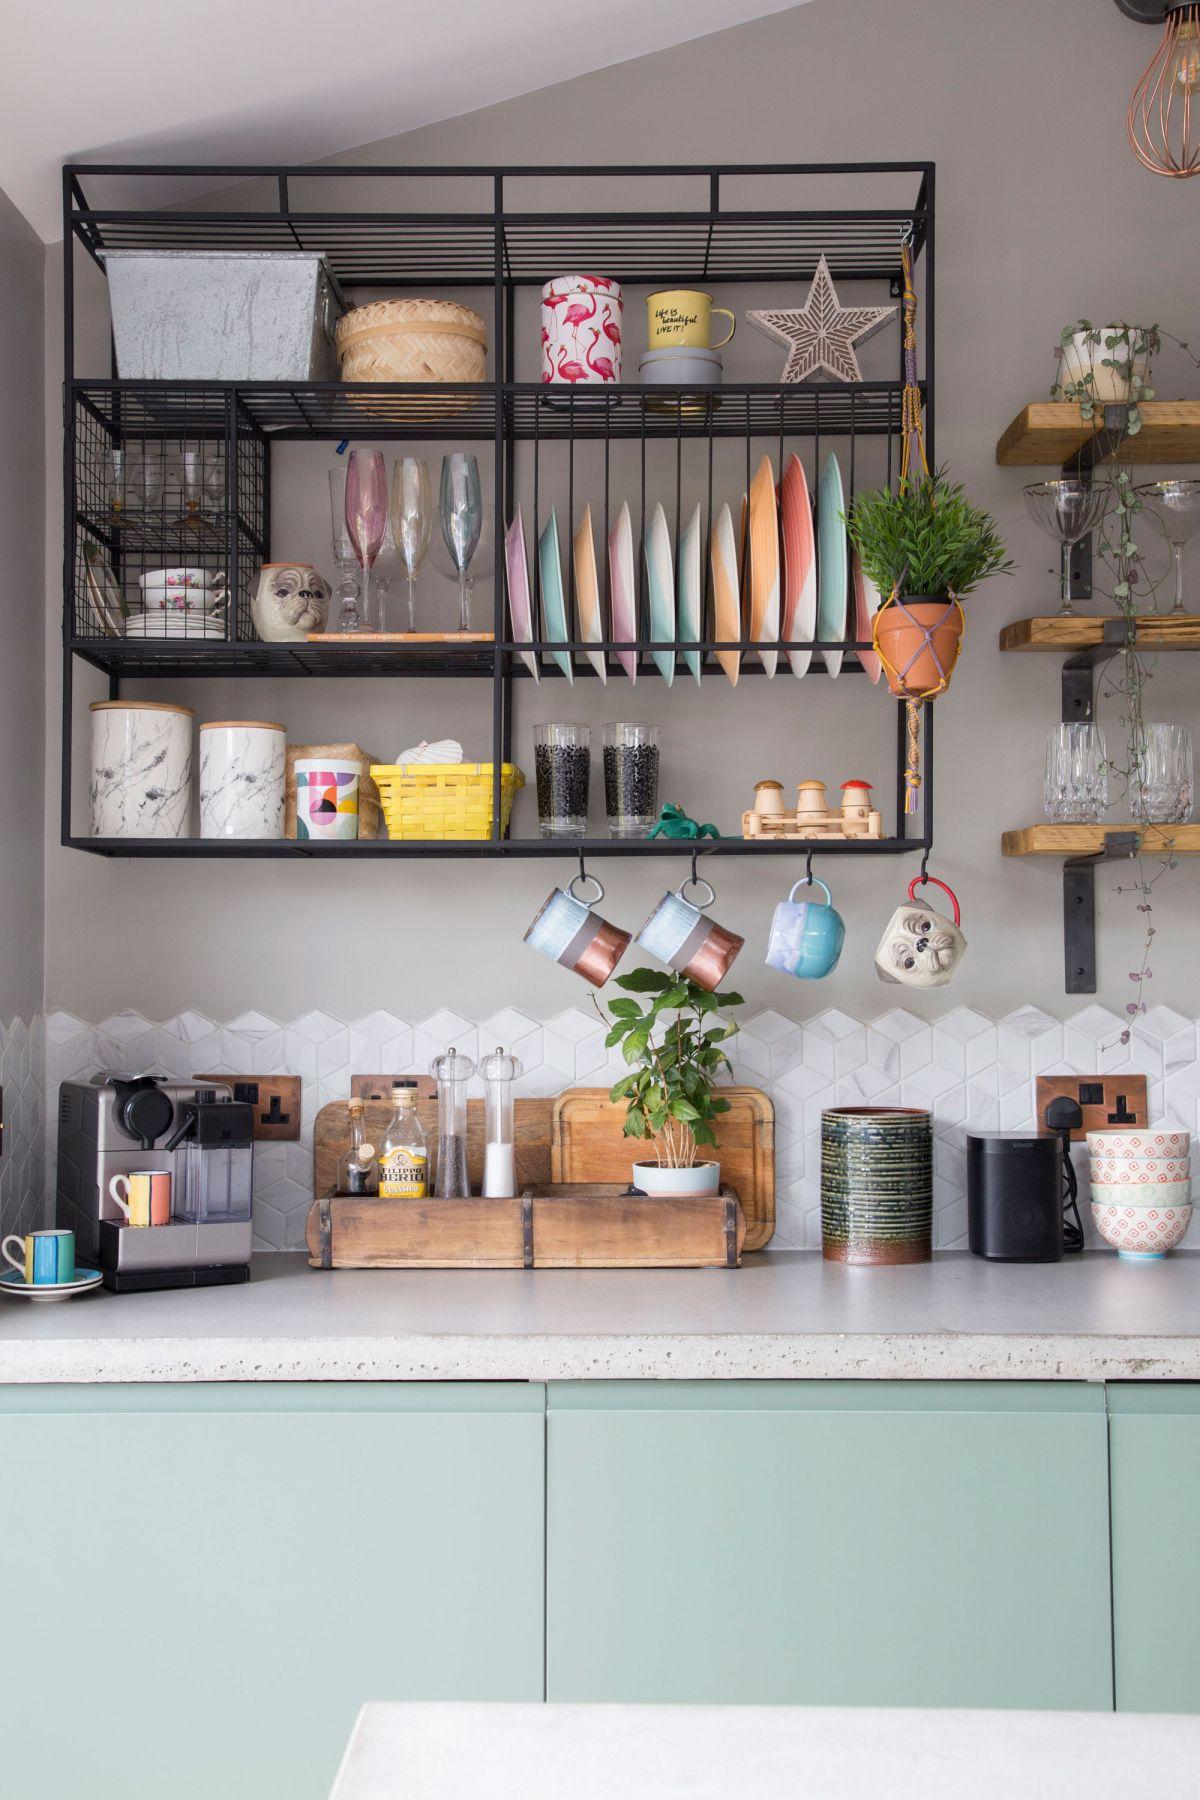 38 Unique Kitchen Storage Ideas Easy Storage Solutions for